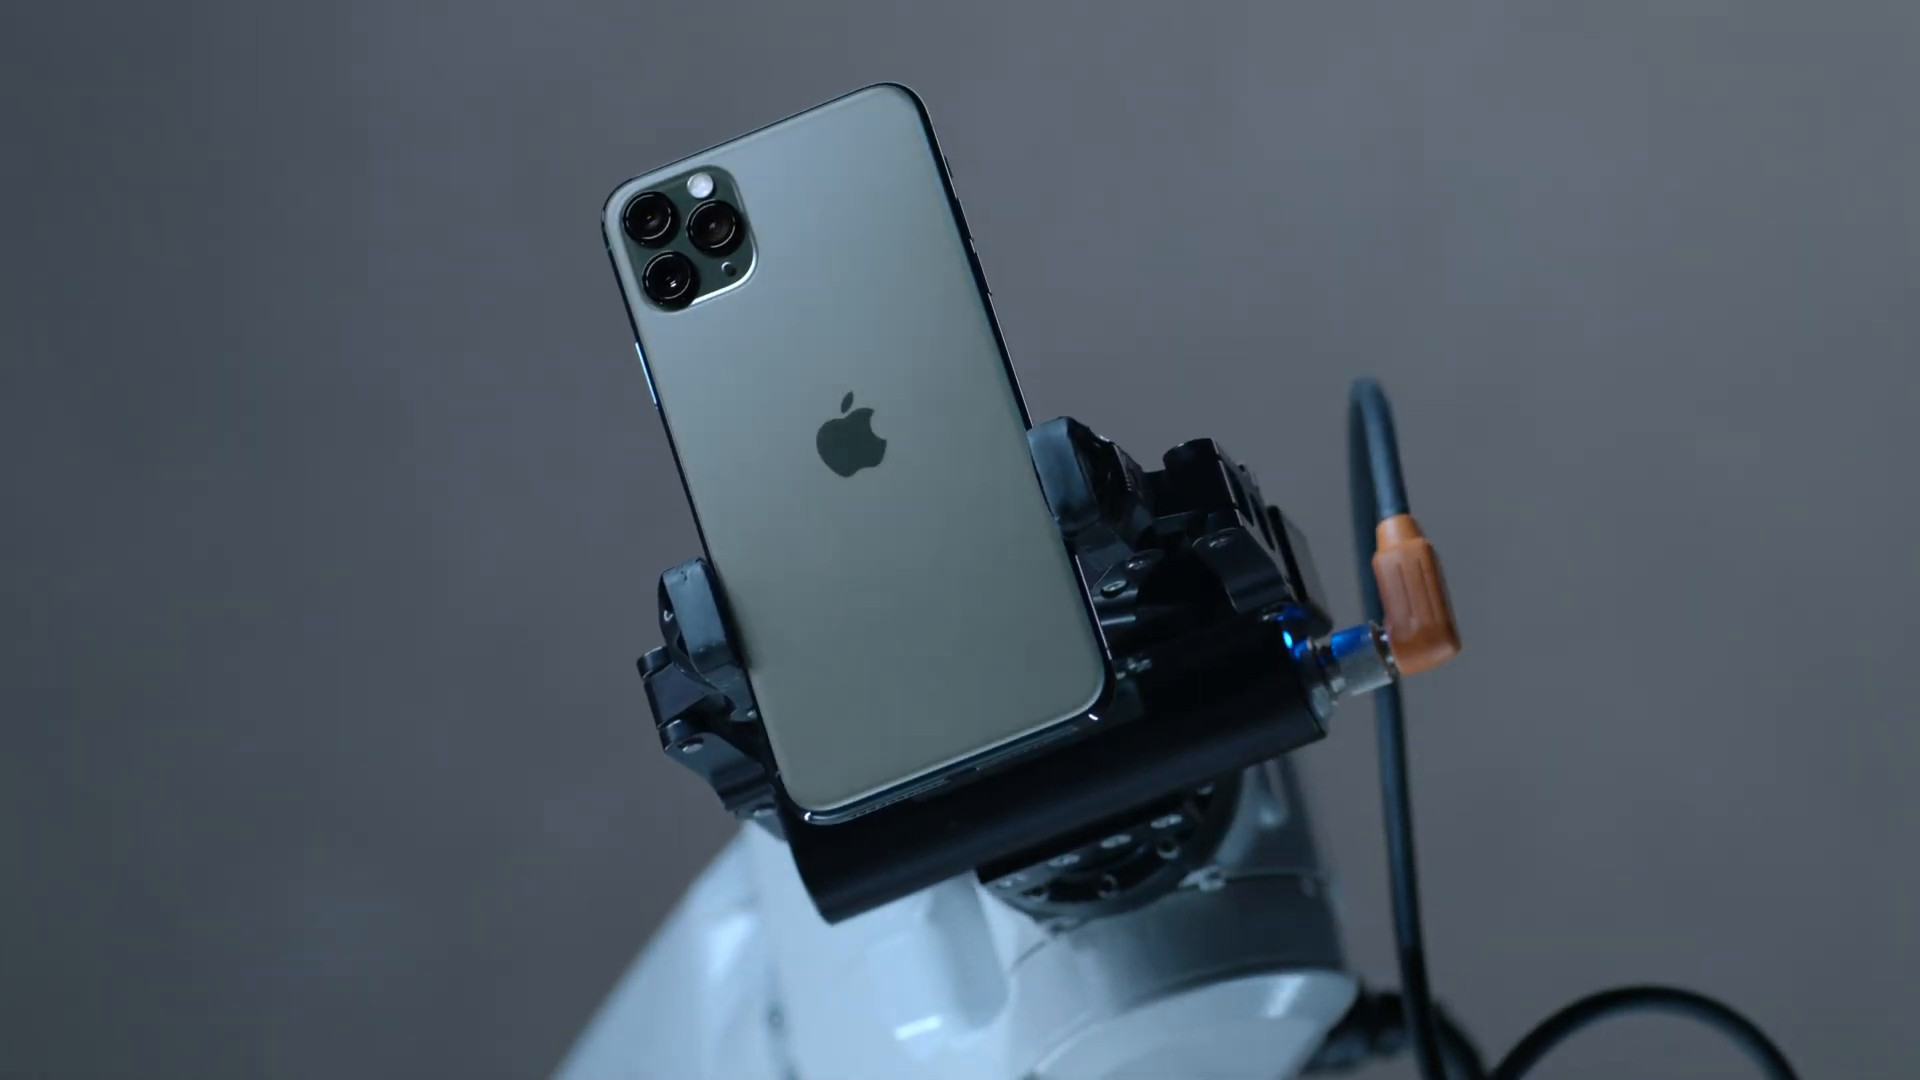 Iphone 11 Pro Apples Promo Video